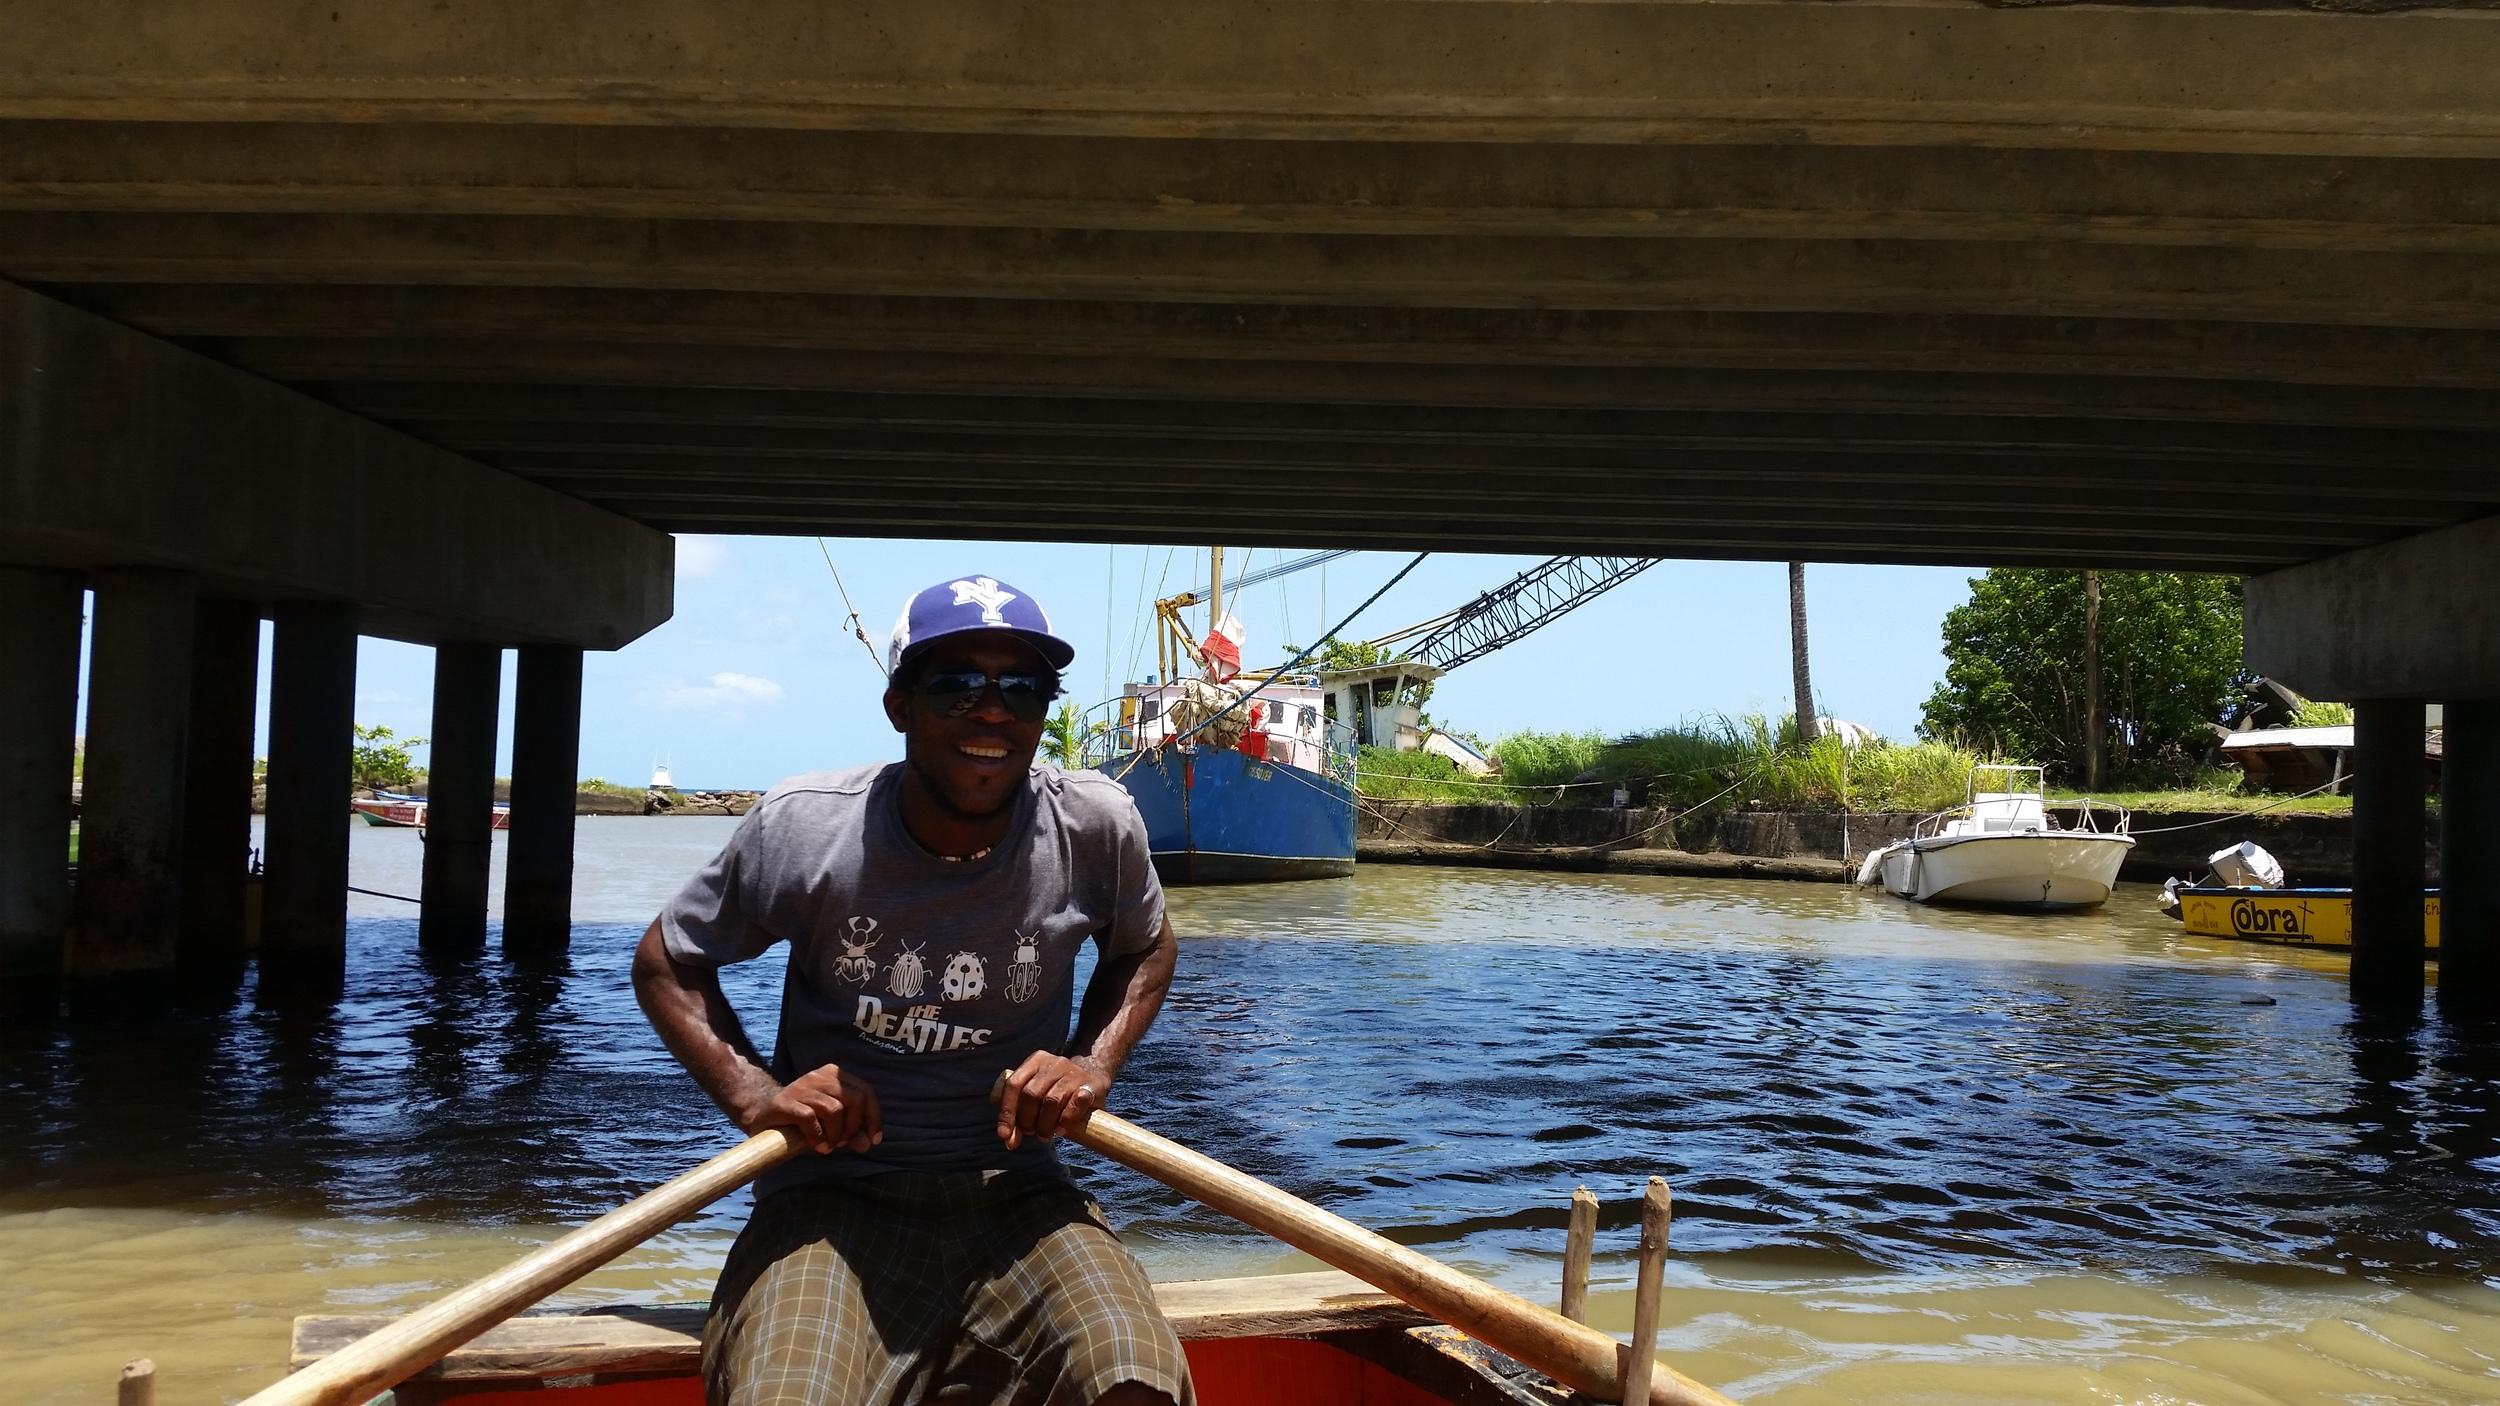 david the boatman